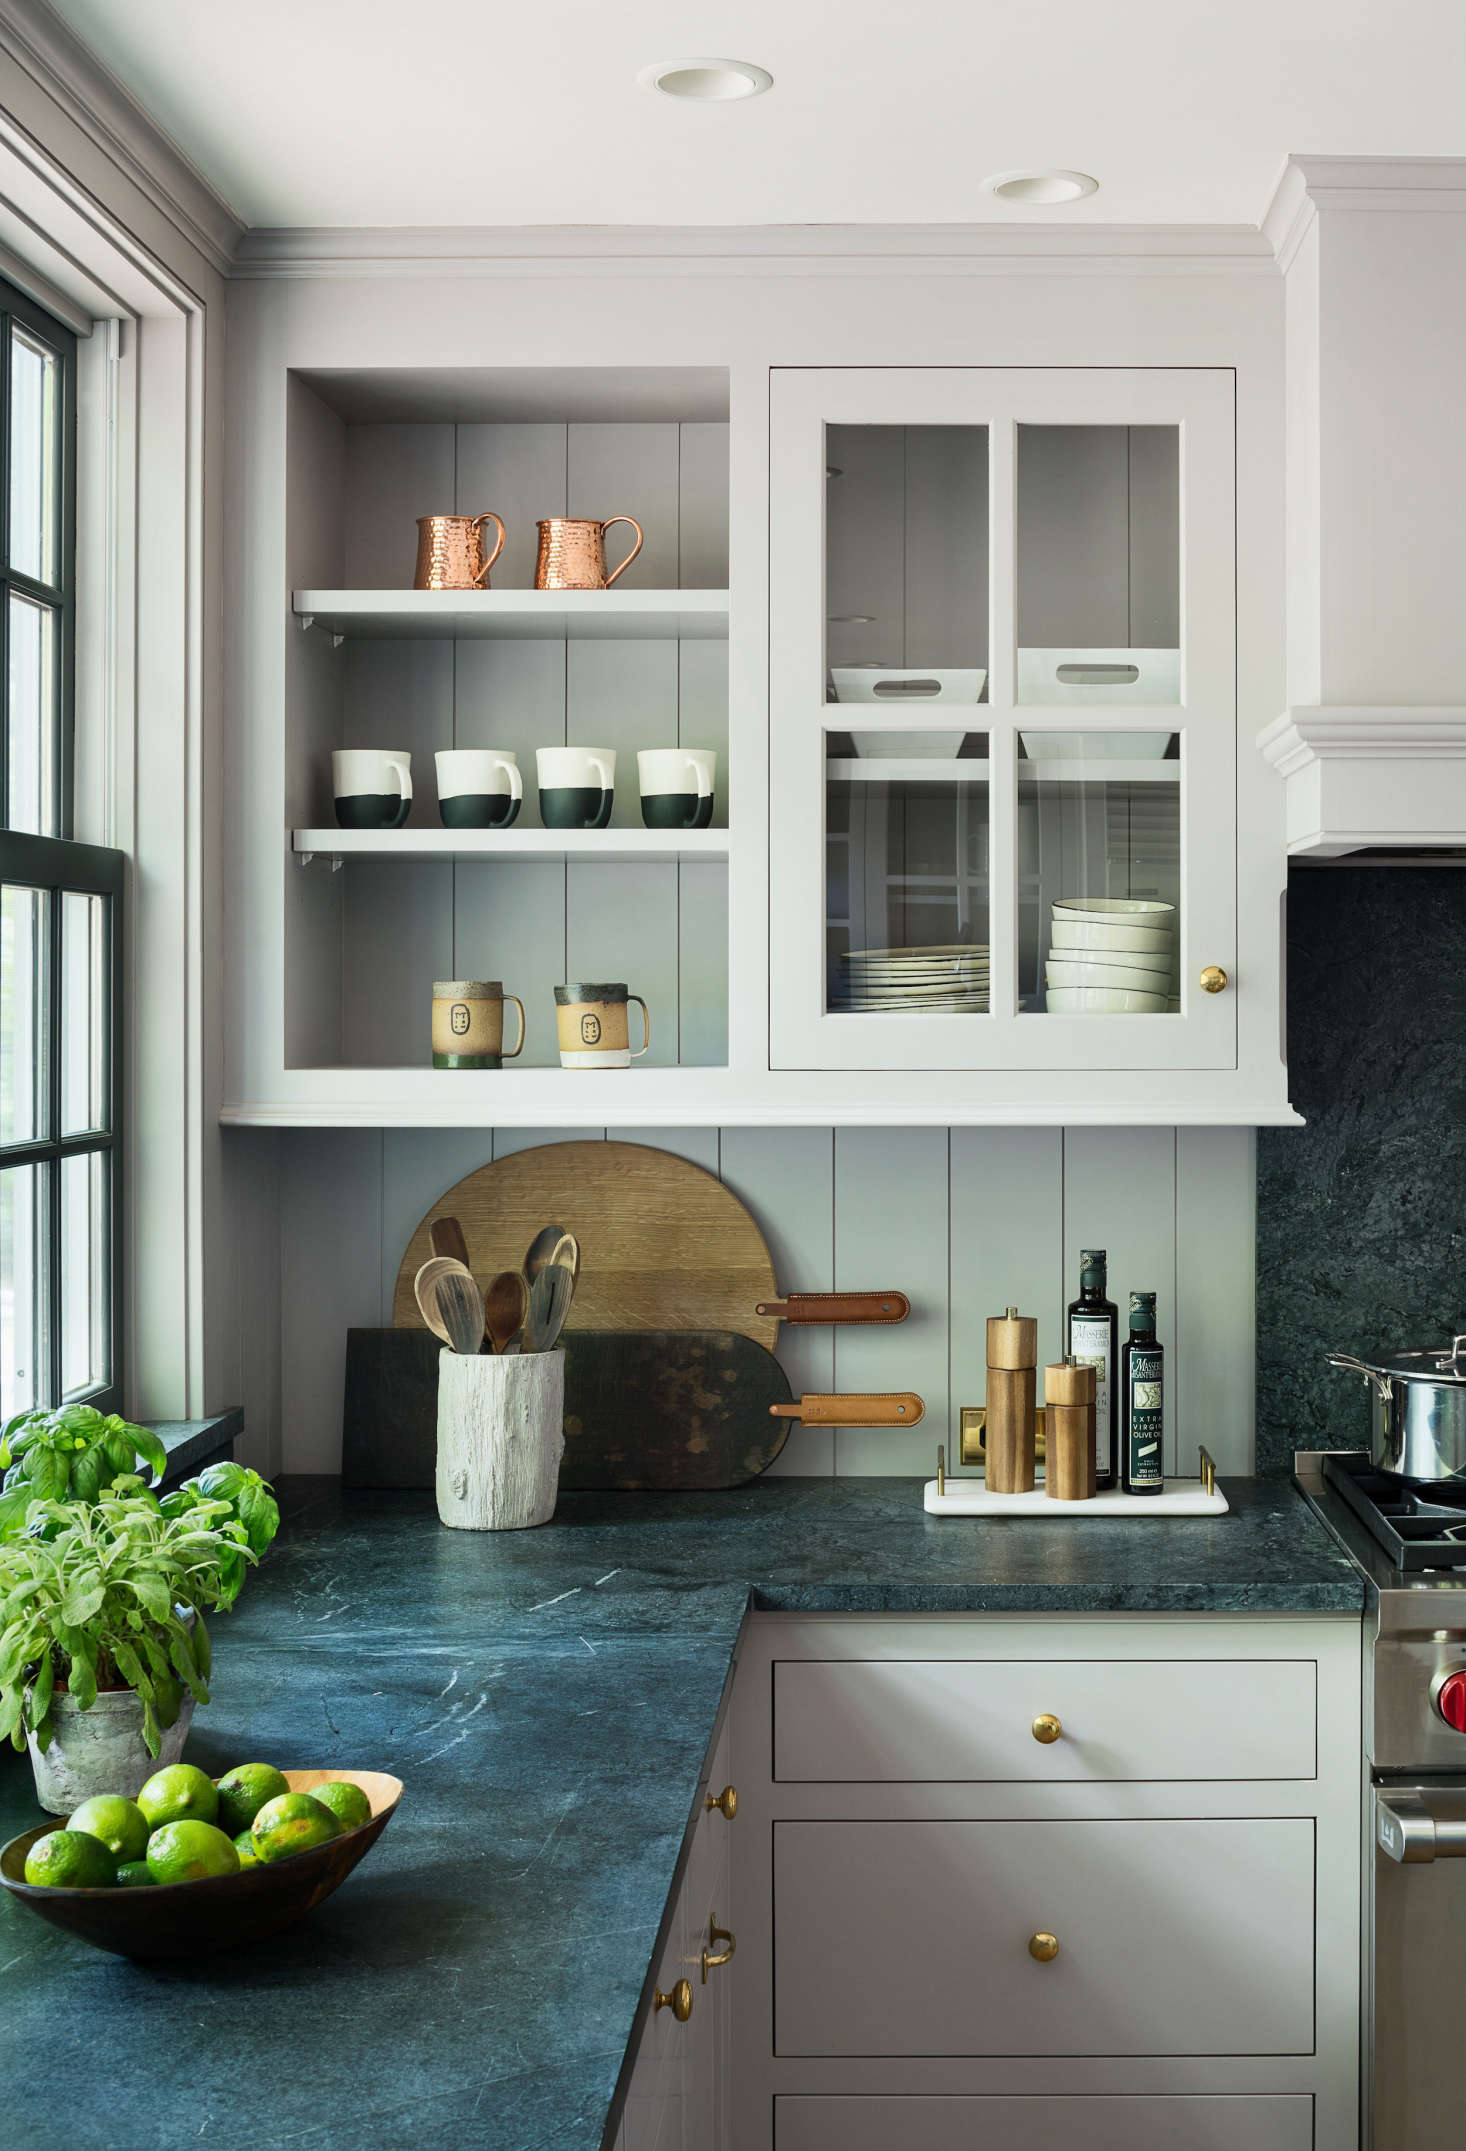 kitchen-in-modern-farmhouse-renovation-light-gray-cabinets